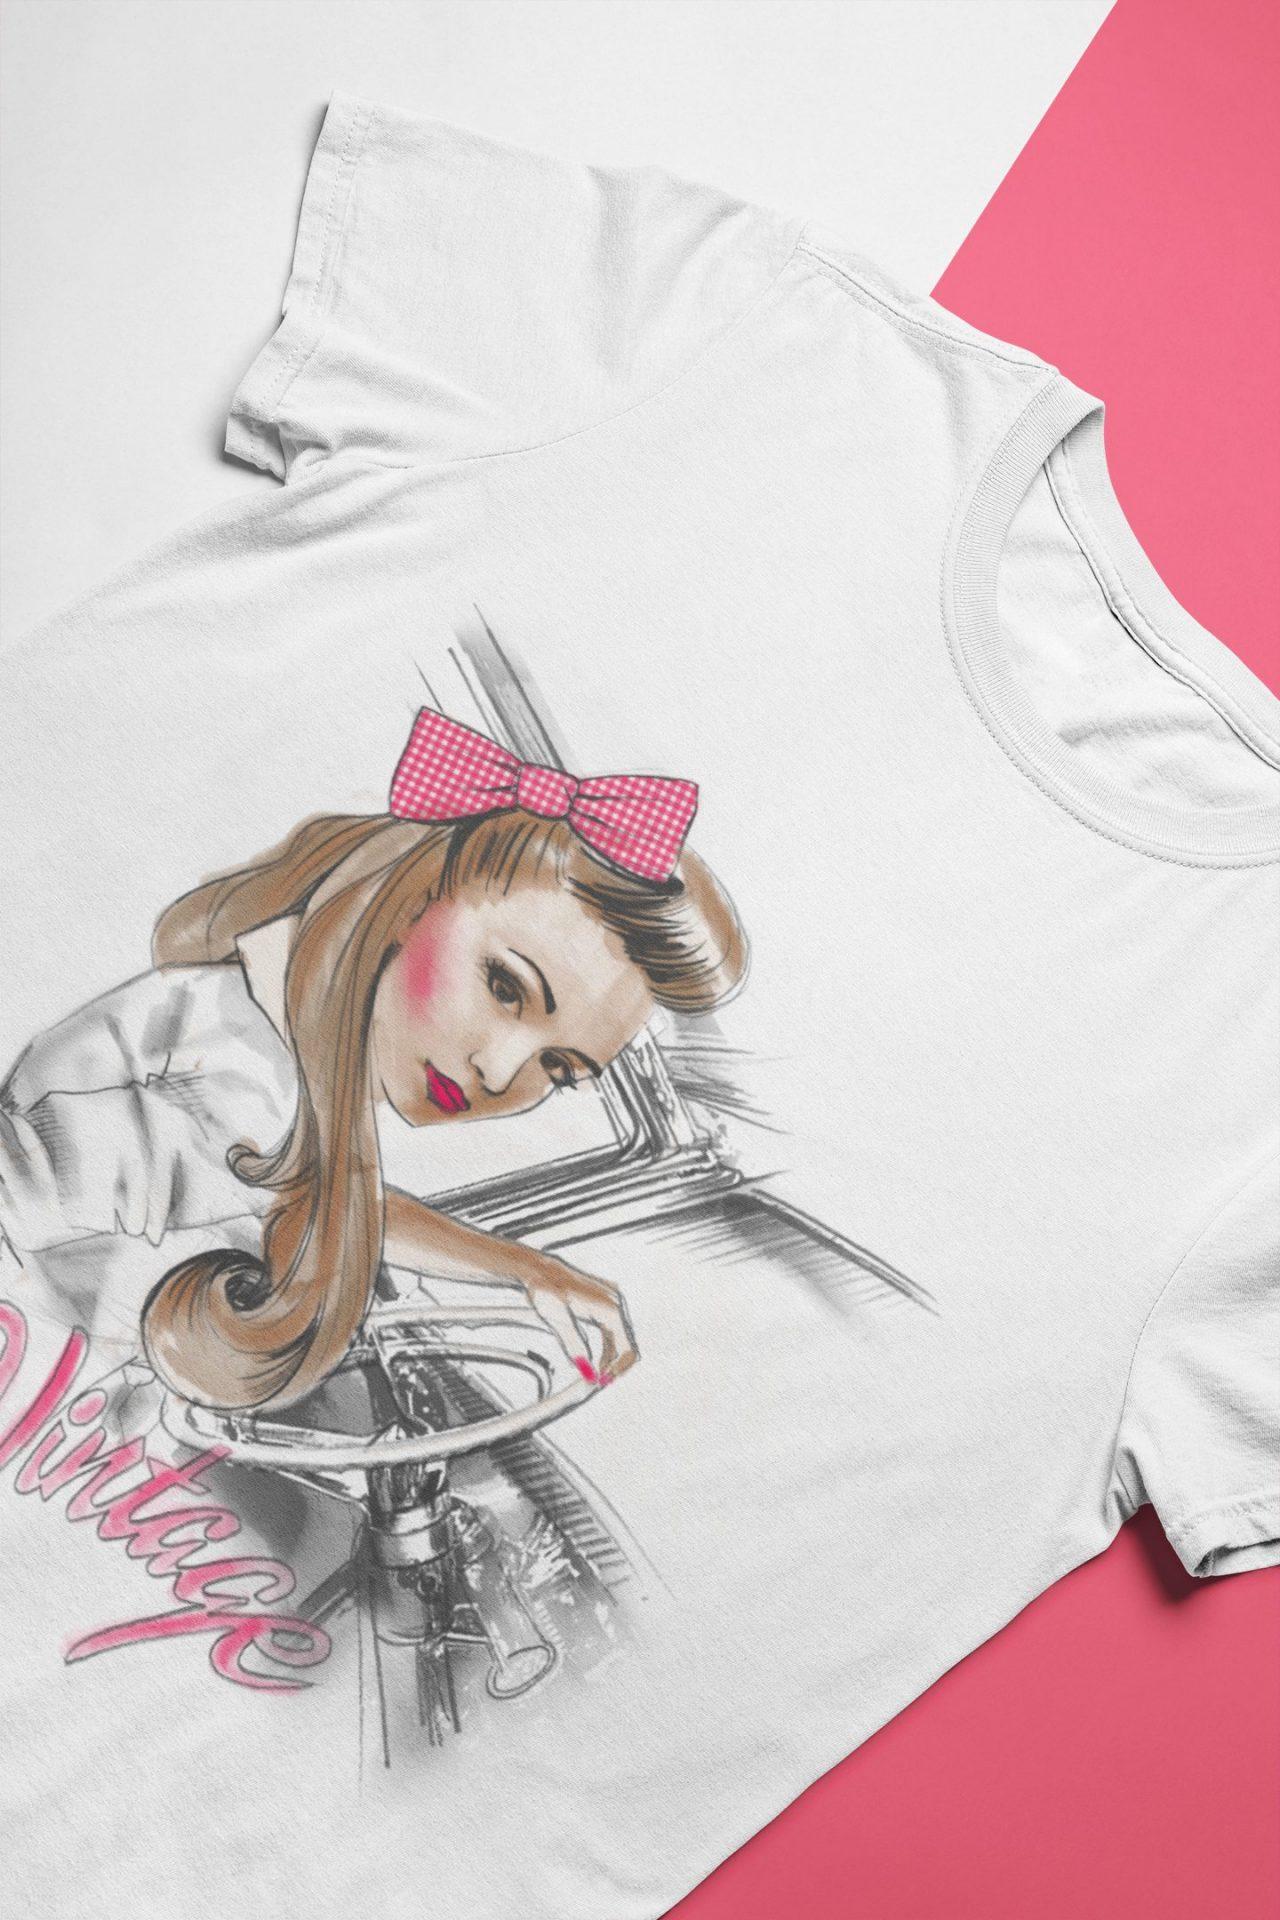 Vintage 50s Pin Up Lady T-Shirt, Motiv schöne Frau im Auto am Steuer